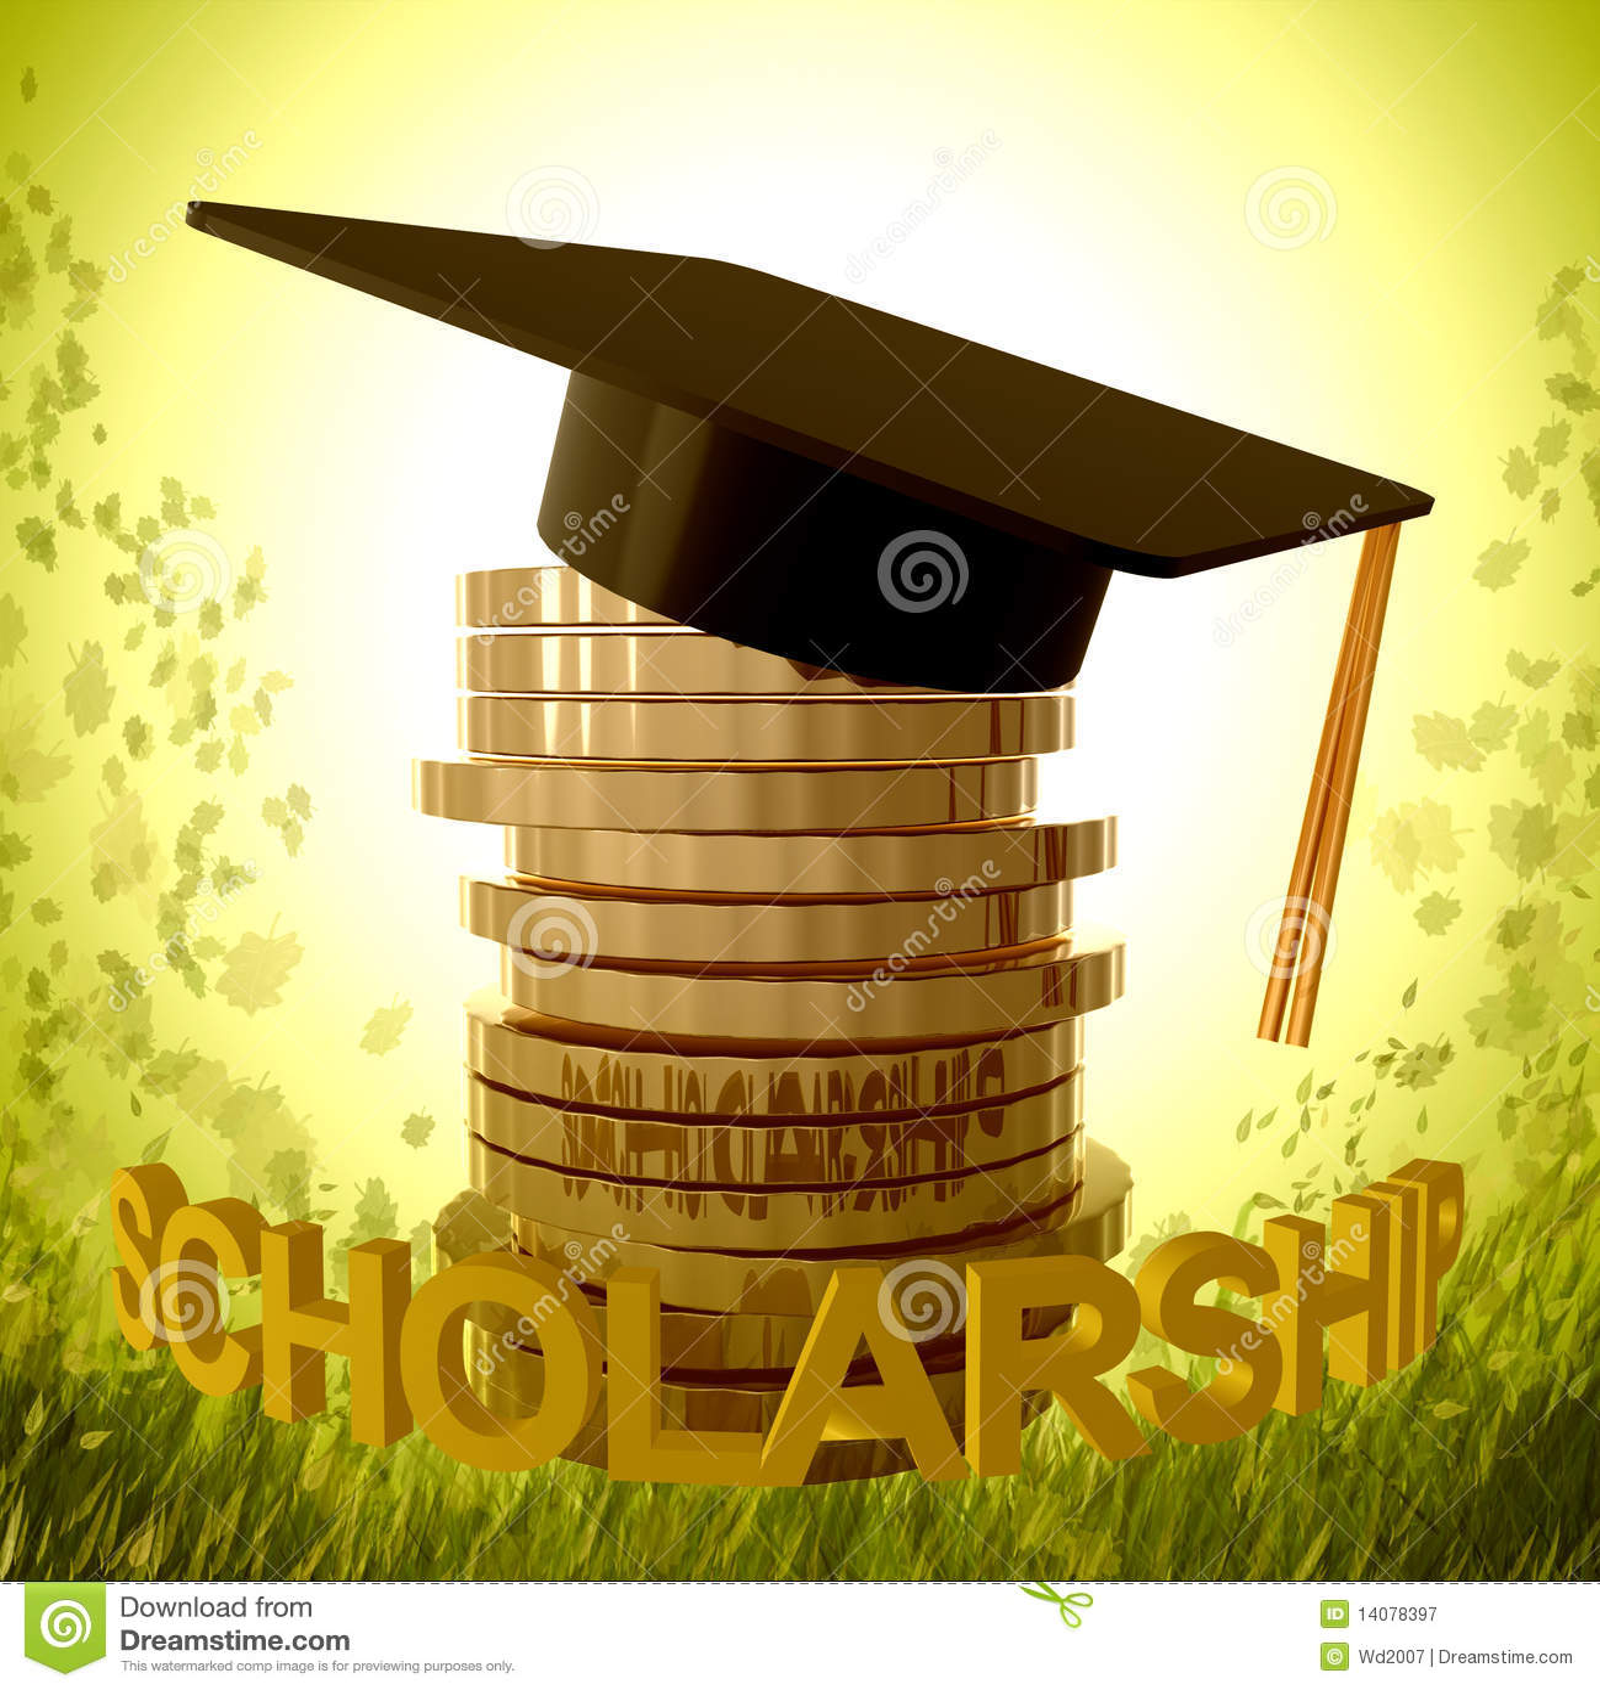 similar stock images of ` Scholarship fund and graduation symbol